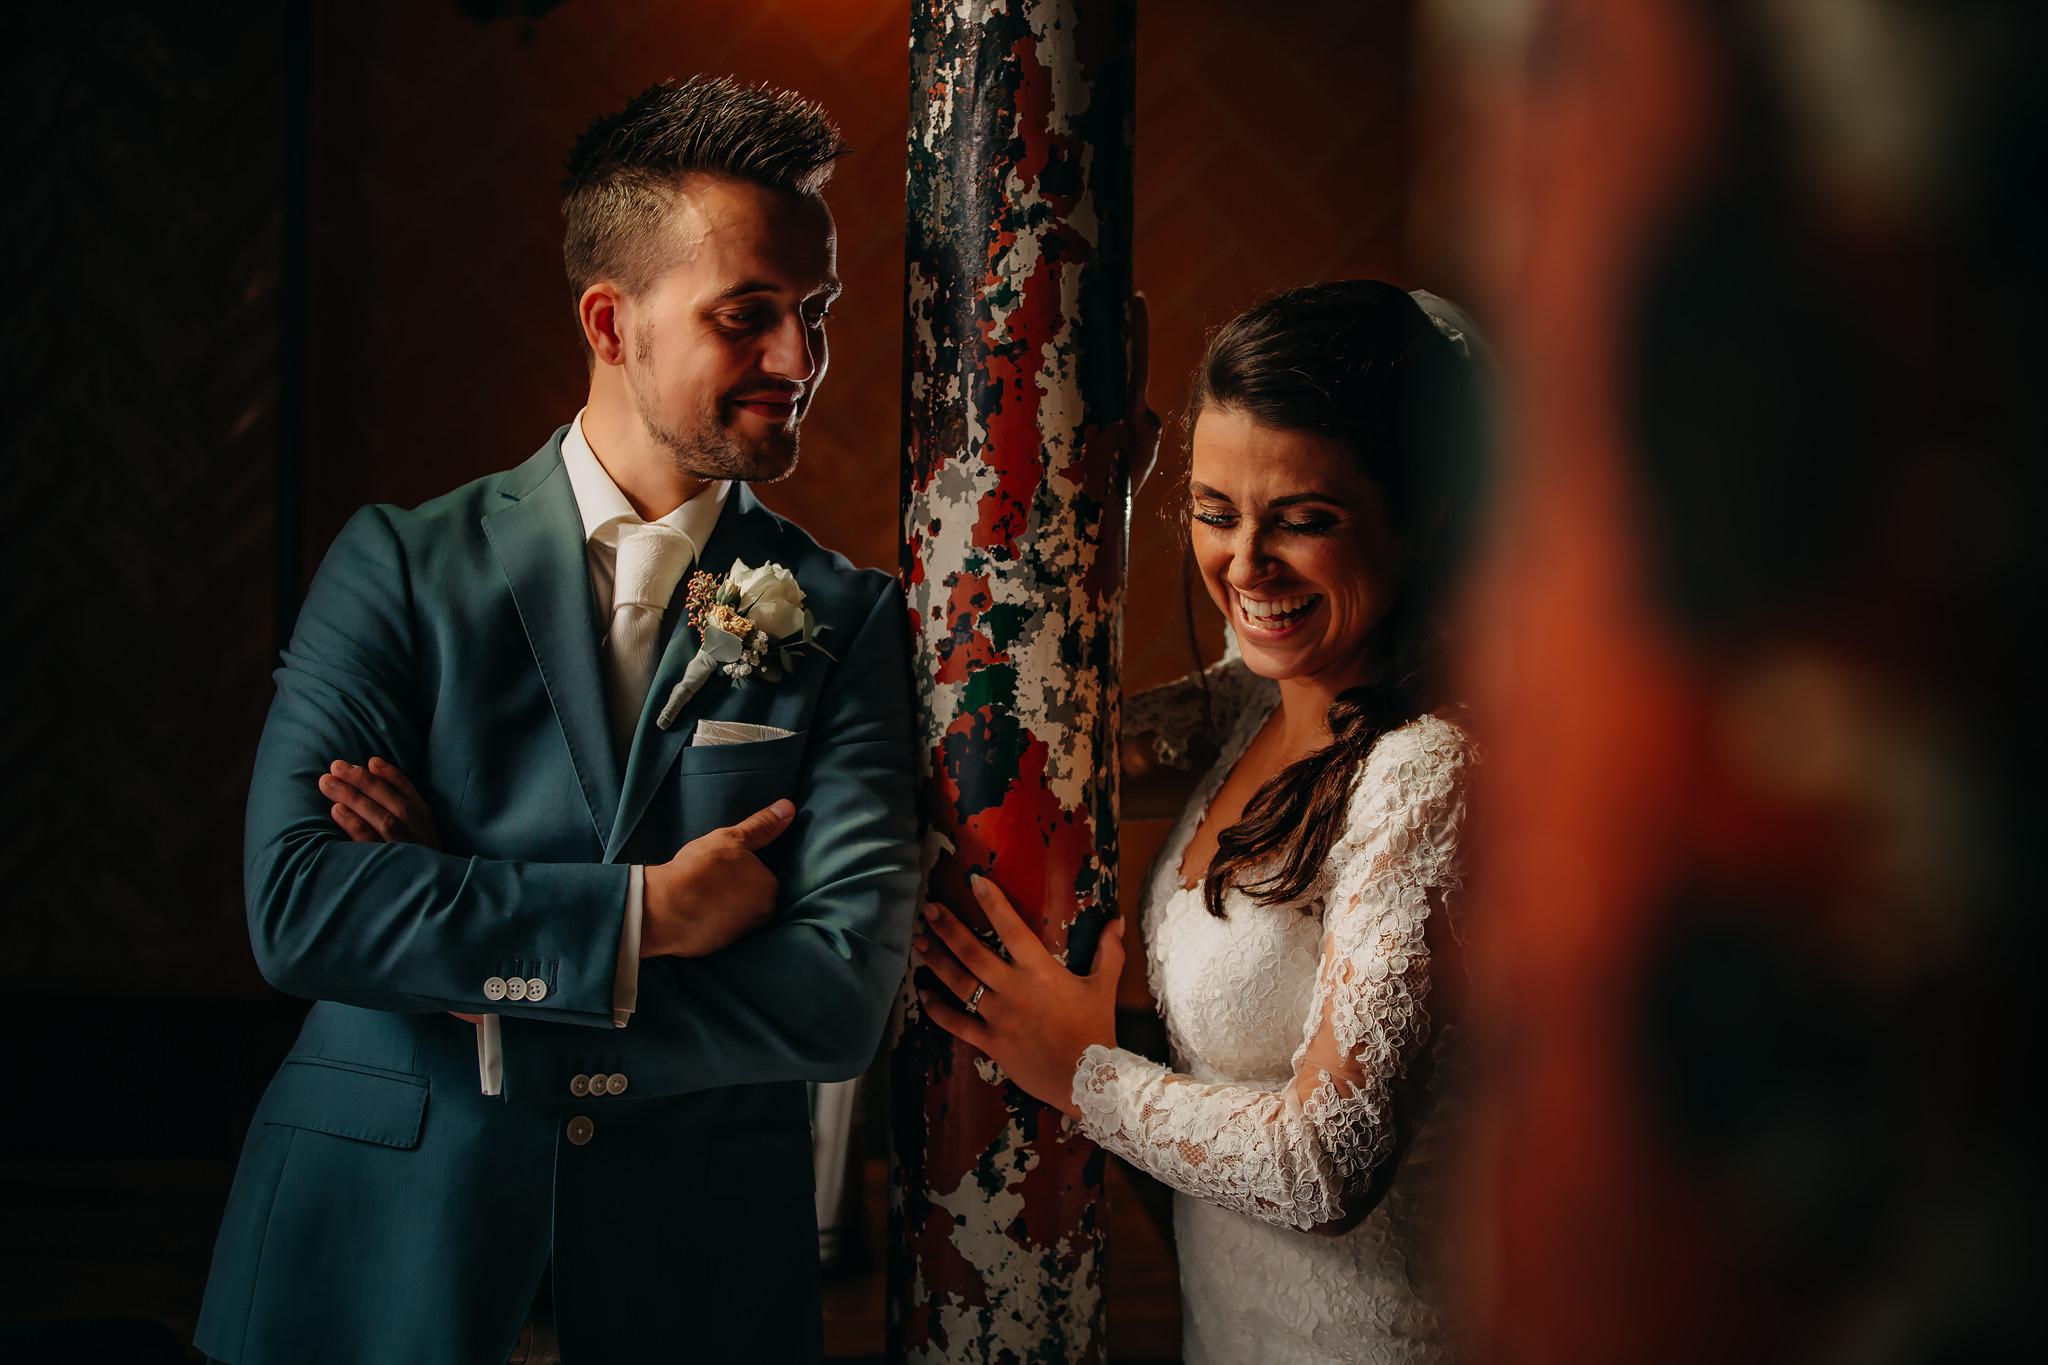 Bruidsreportage Bruidsfotografie Wedding Photographer 045 Bas Driessen Photography